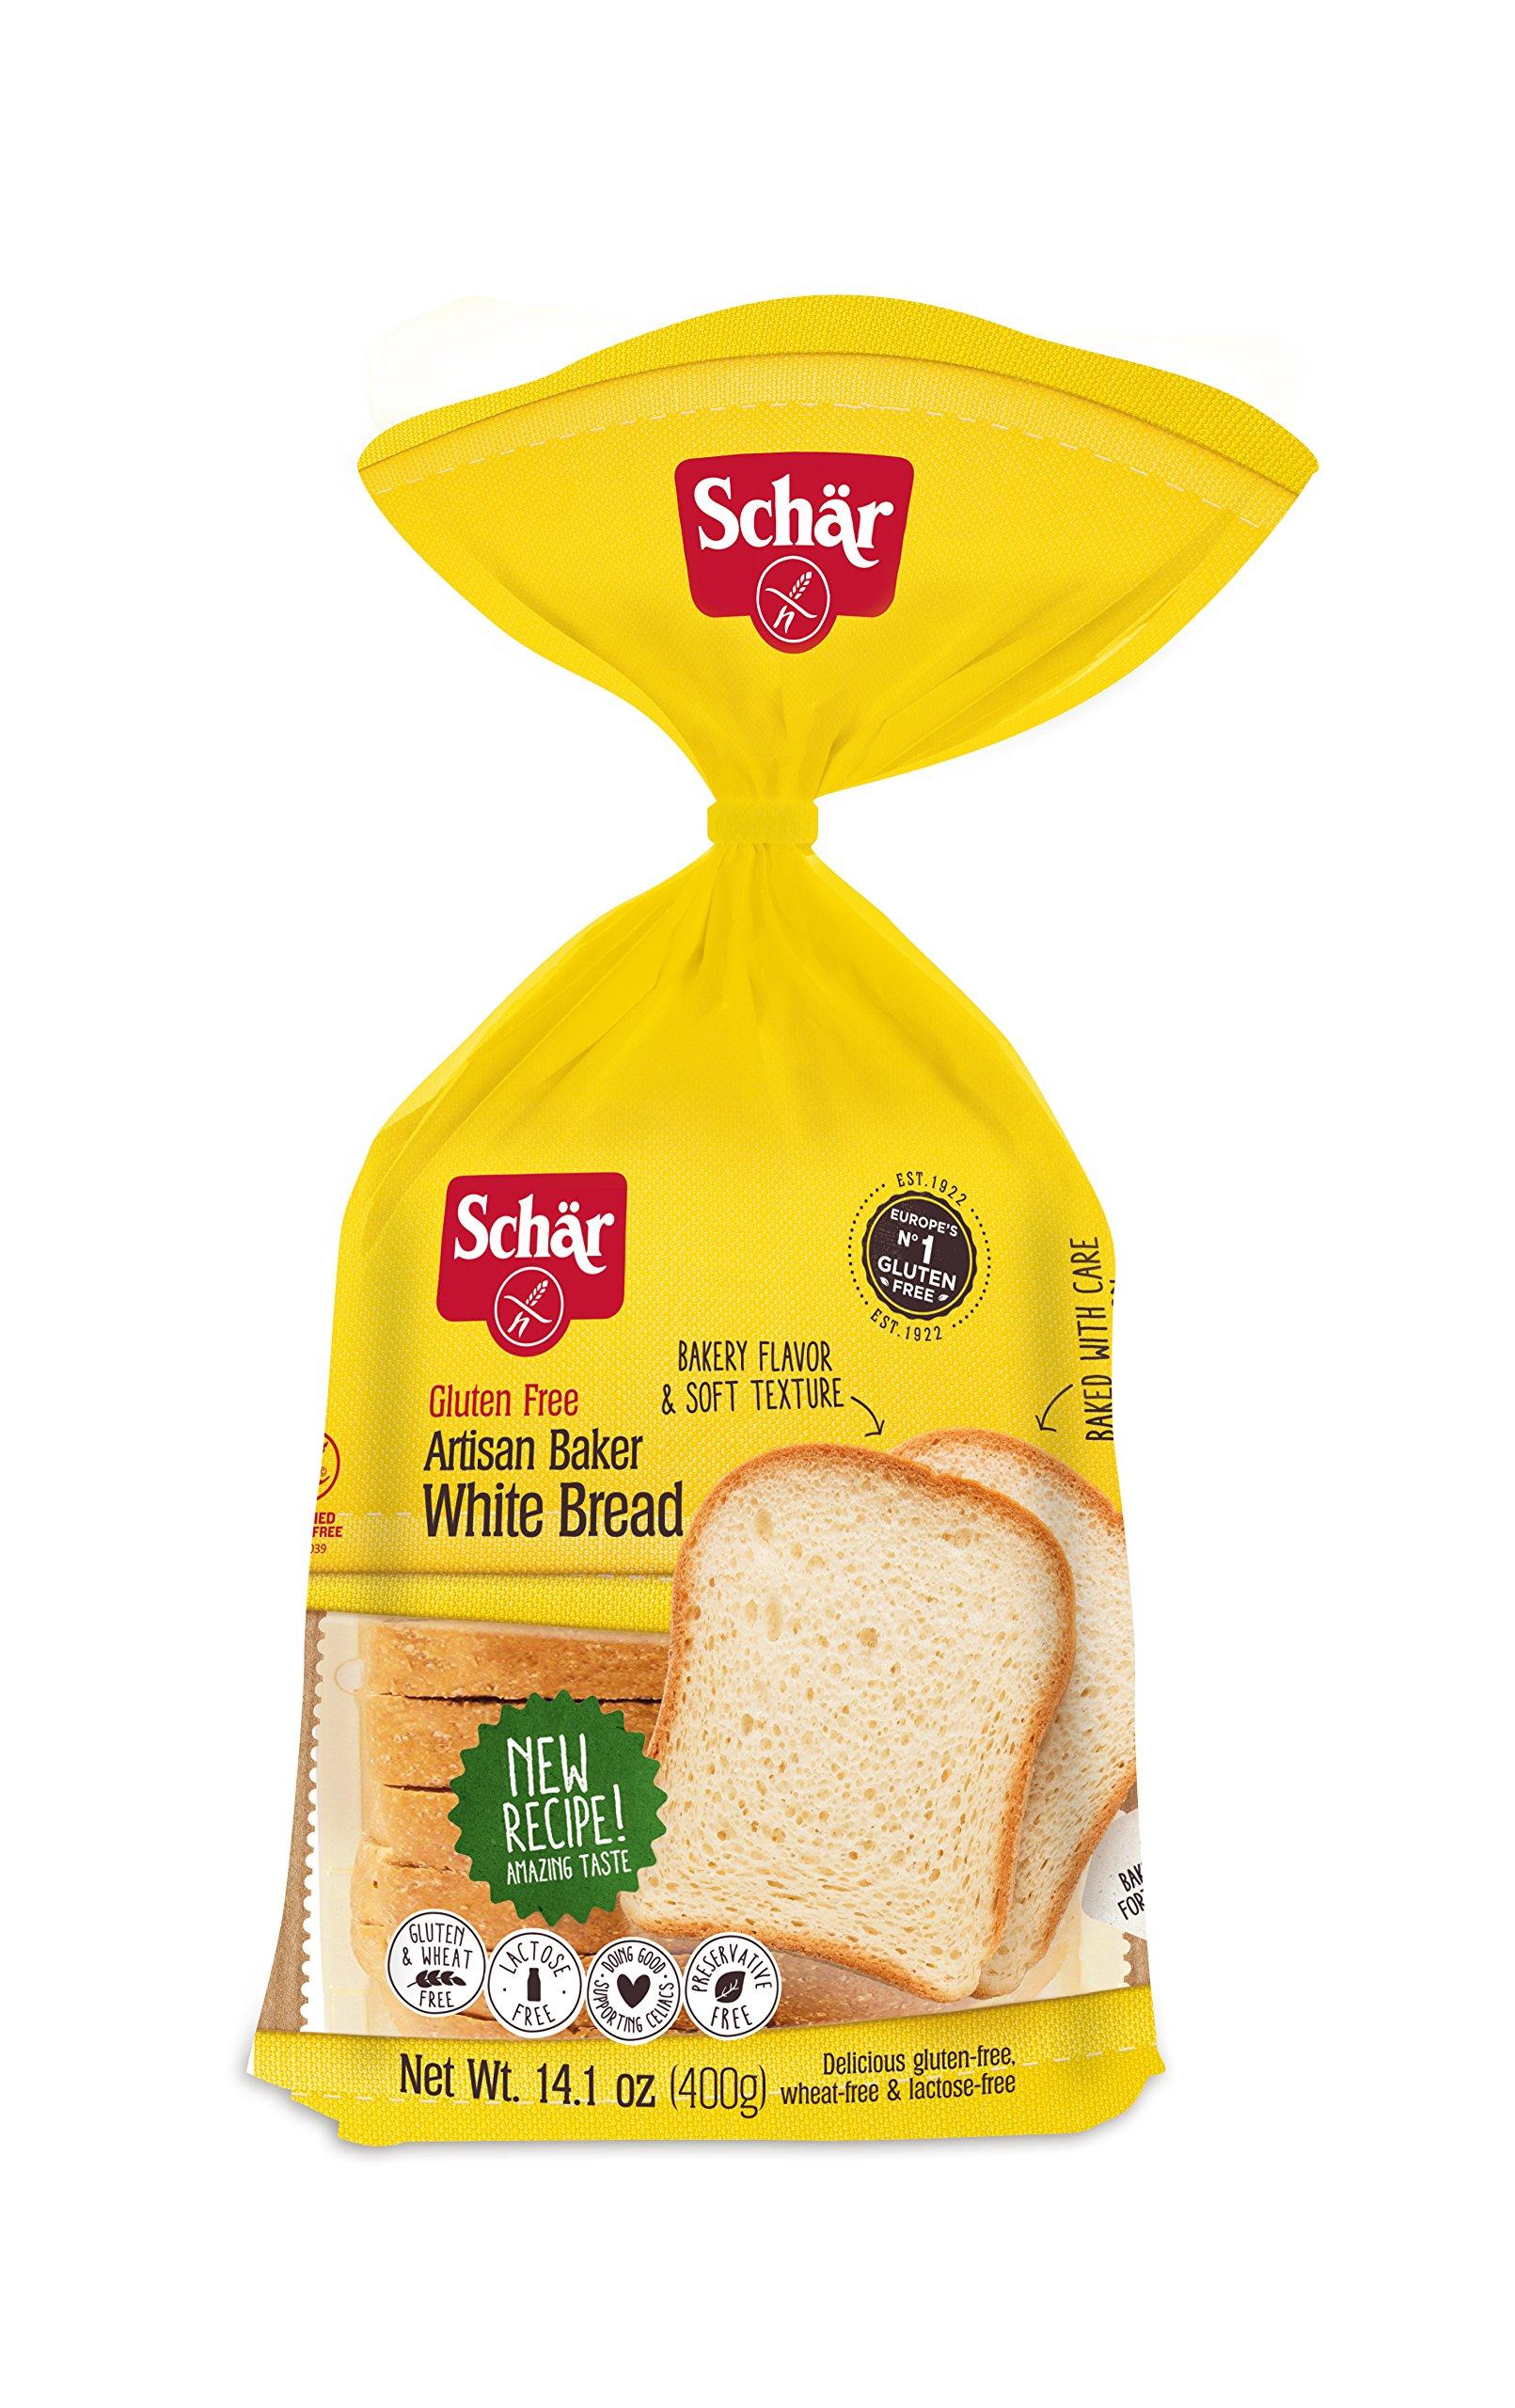 Schar Artisan Baker White Bread Loaf, Gluten-Free, 14.1 Ounce Loaf (Pack of 2) by Schar